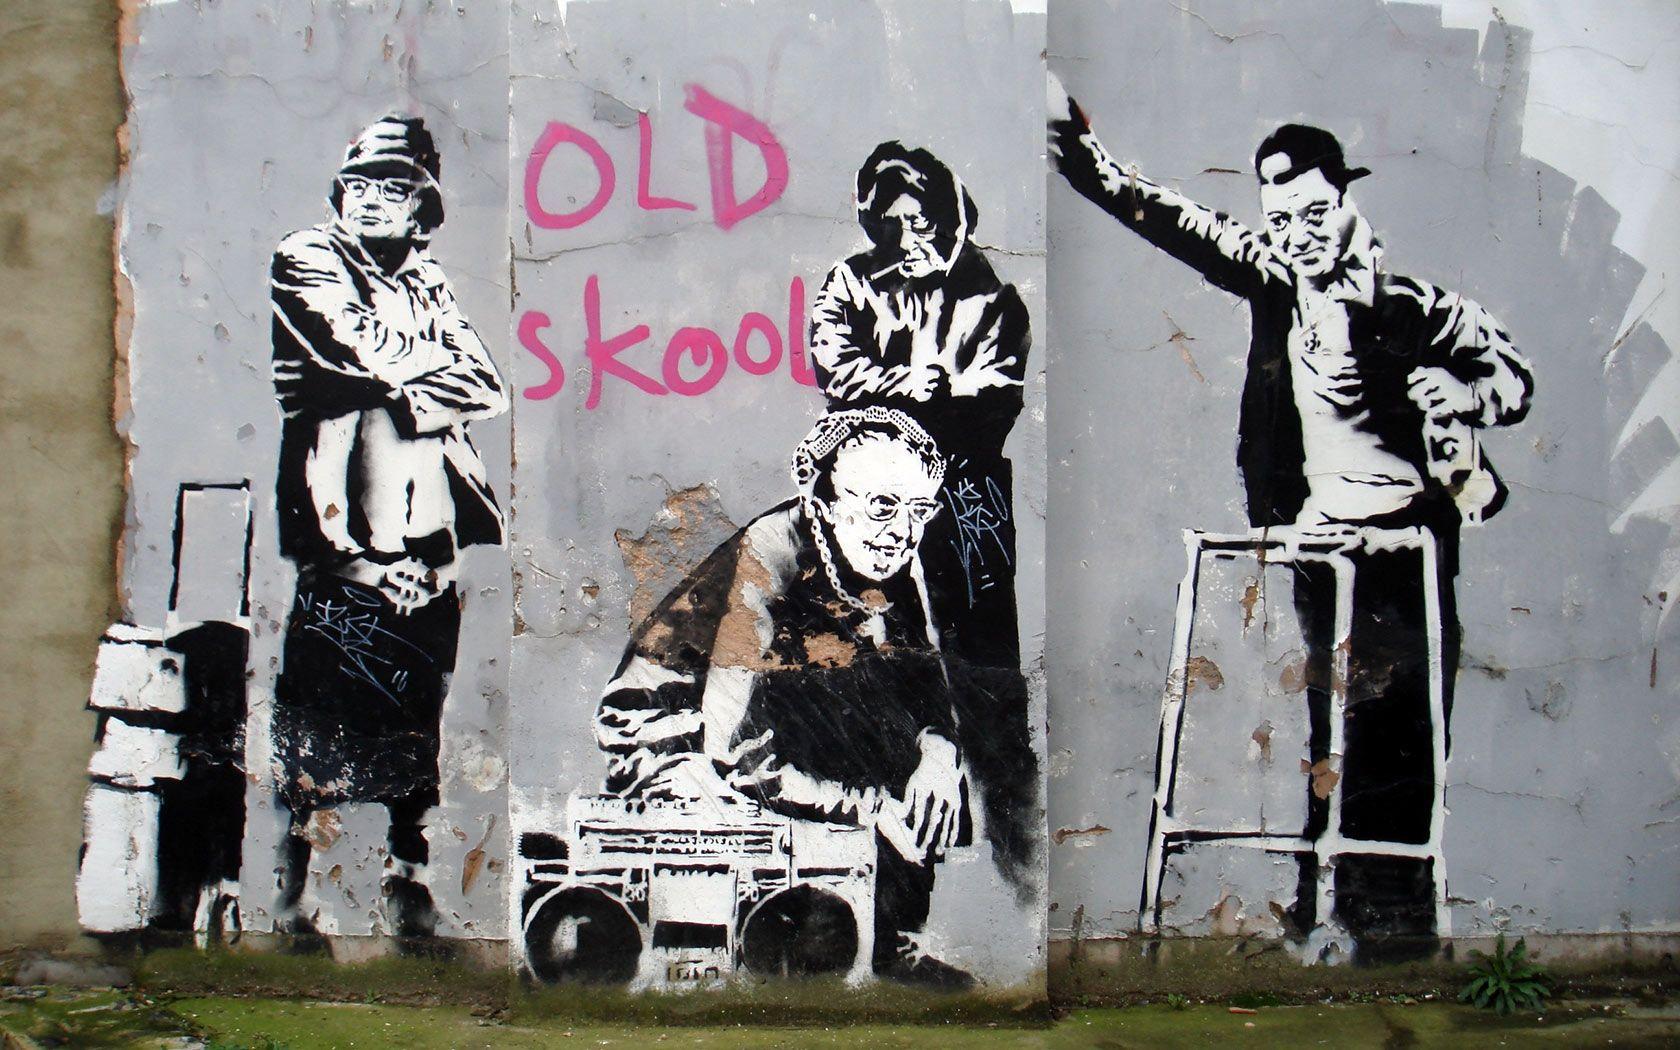 Download Banksy Graffiti WallpaperDownload 1680x1050 Artistic